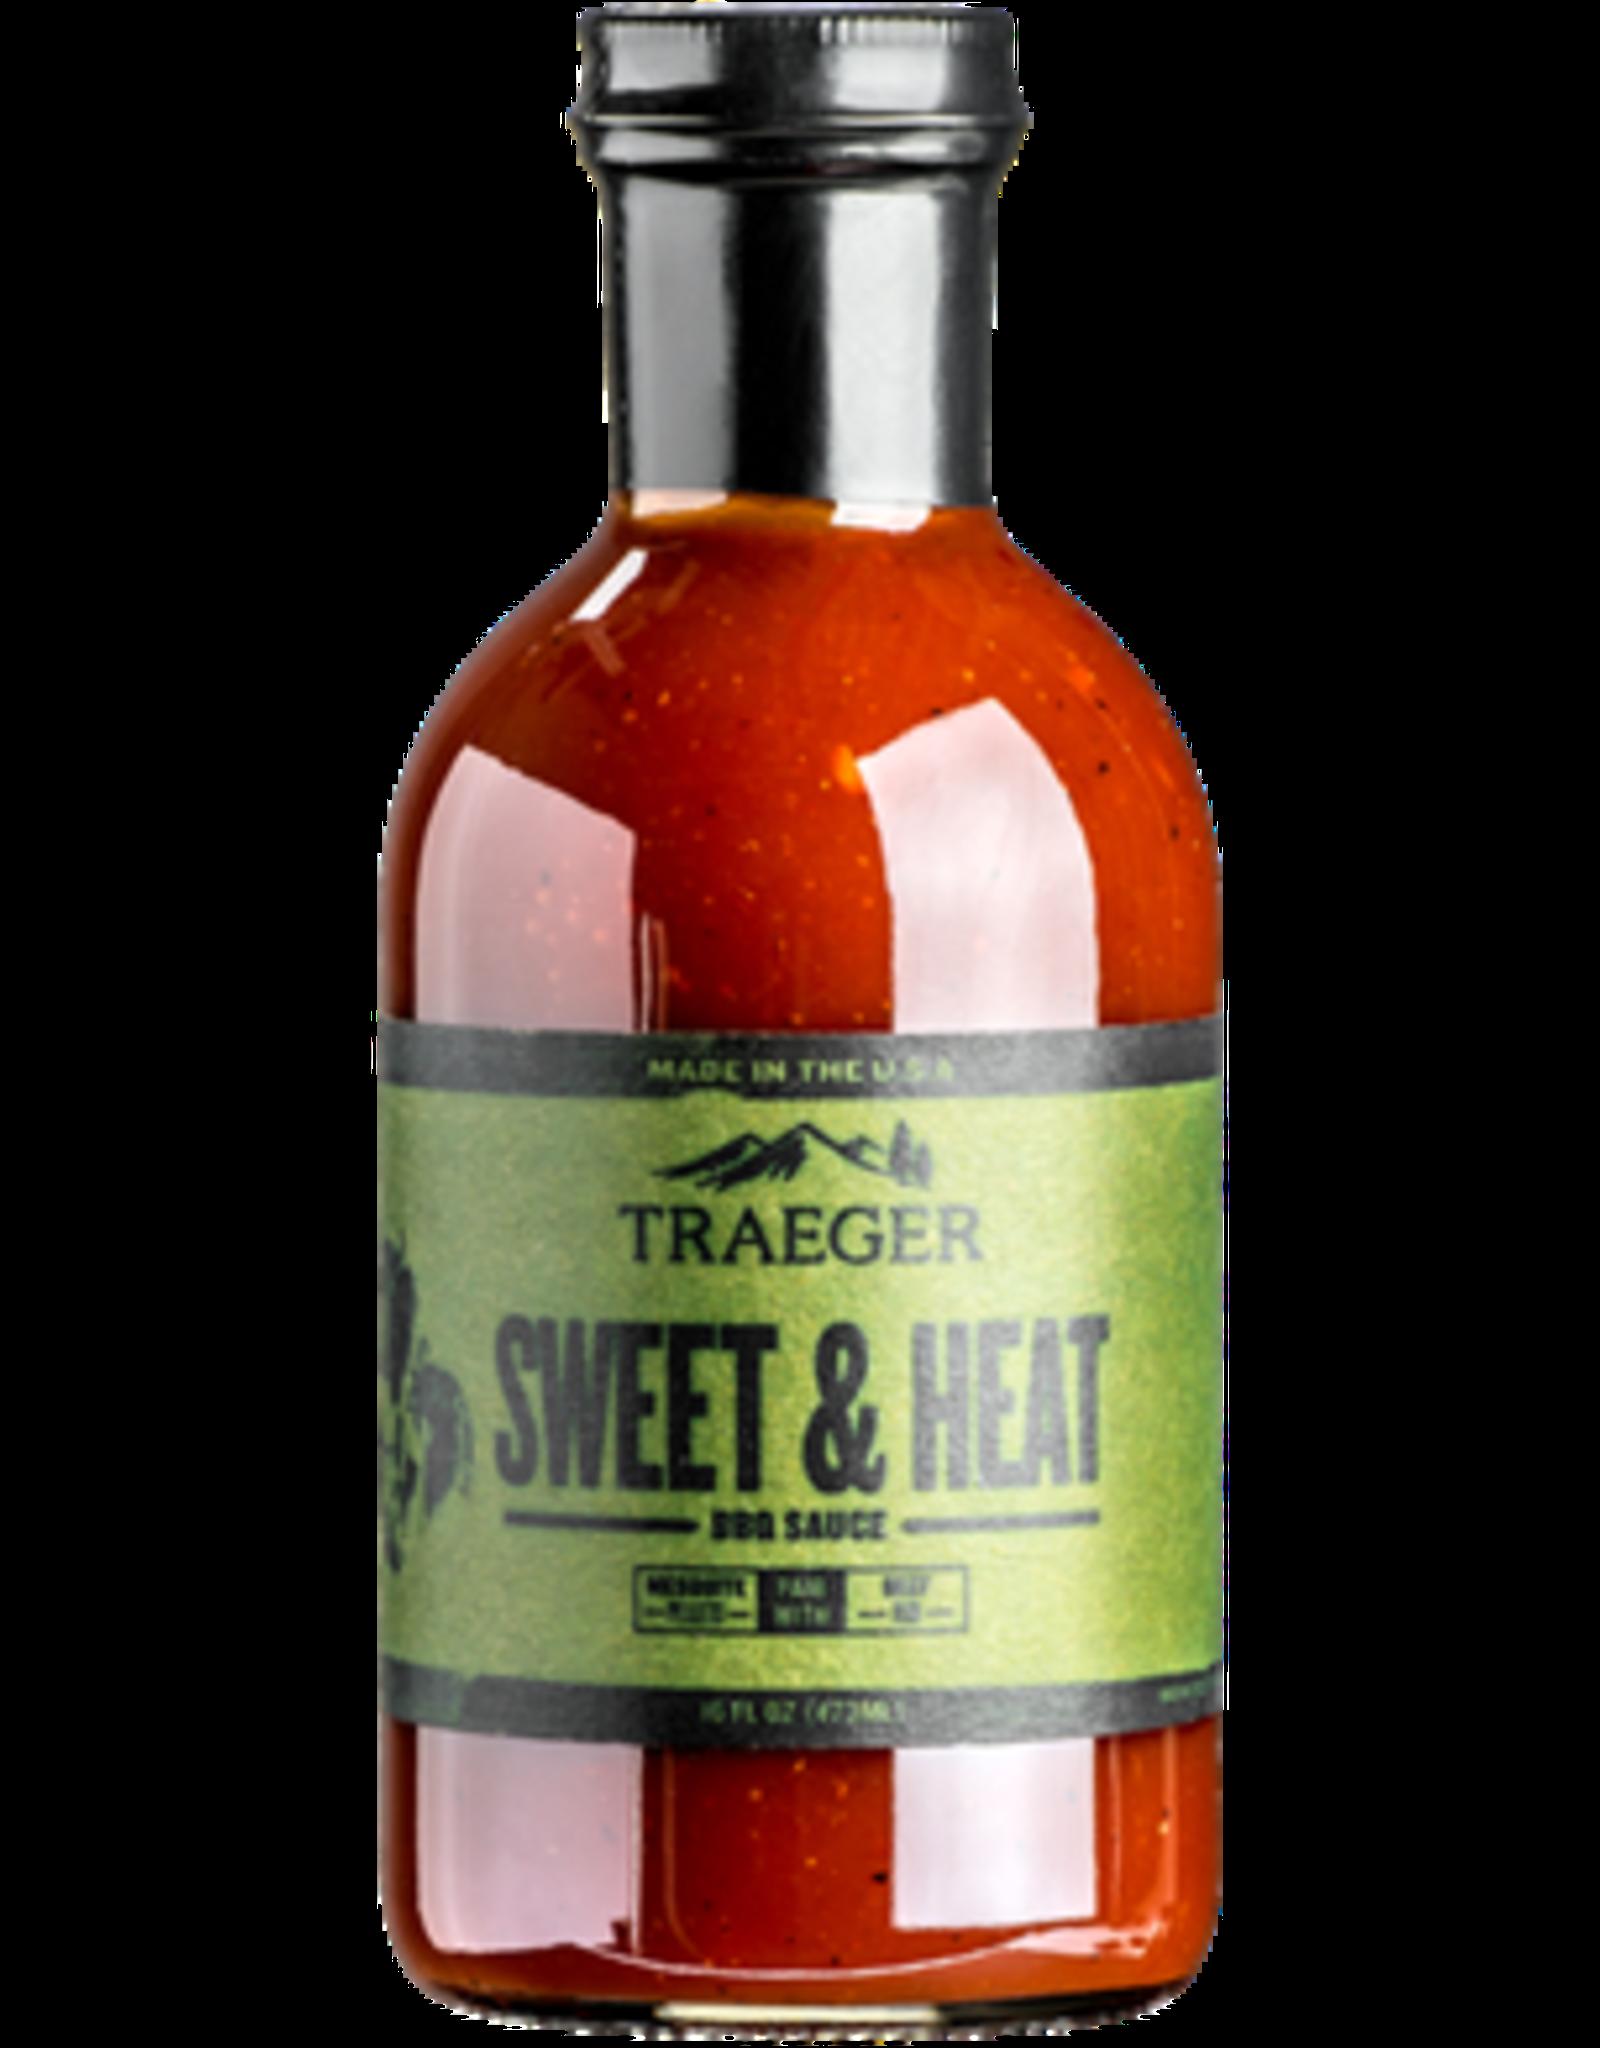 Traeger Traeger Sweet & Heat BBQ Sauce - SAU038